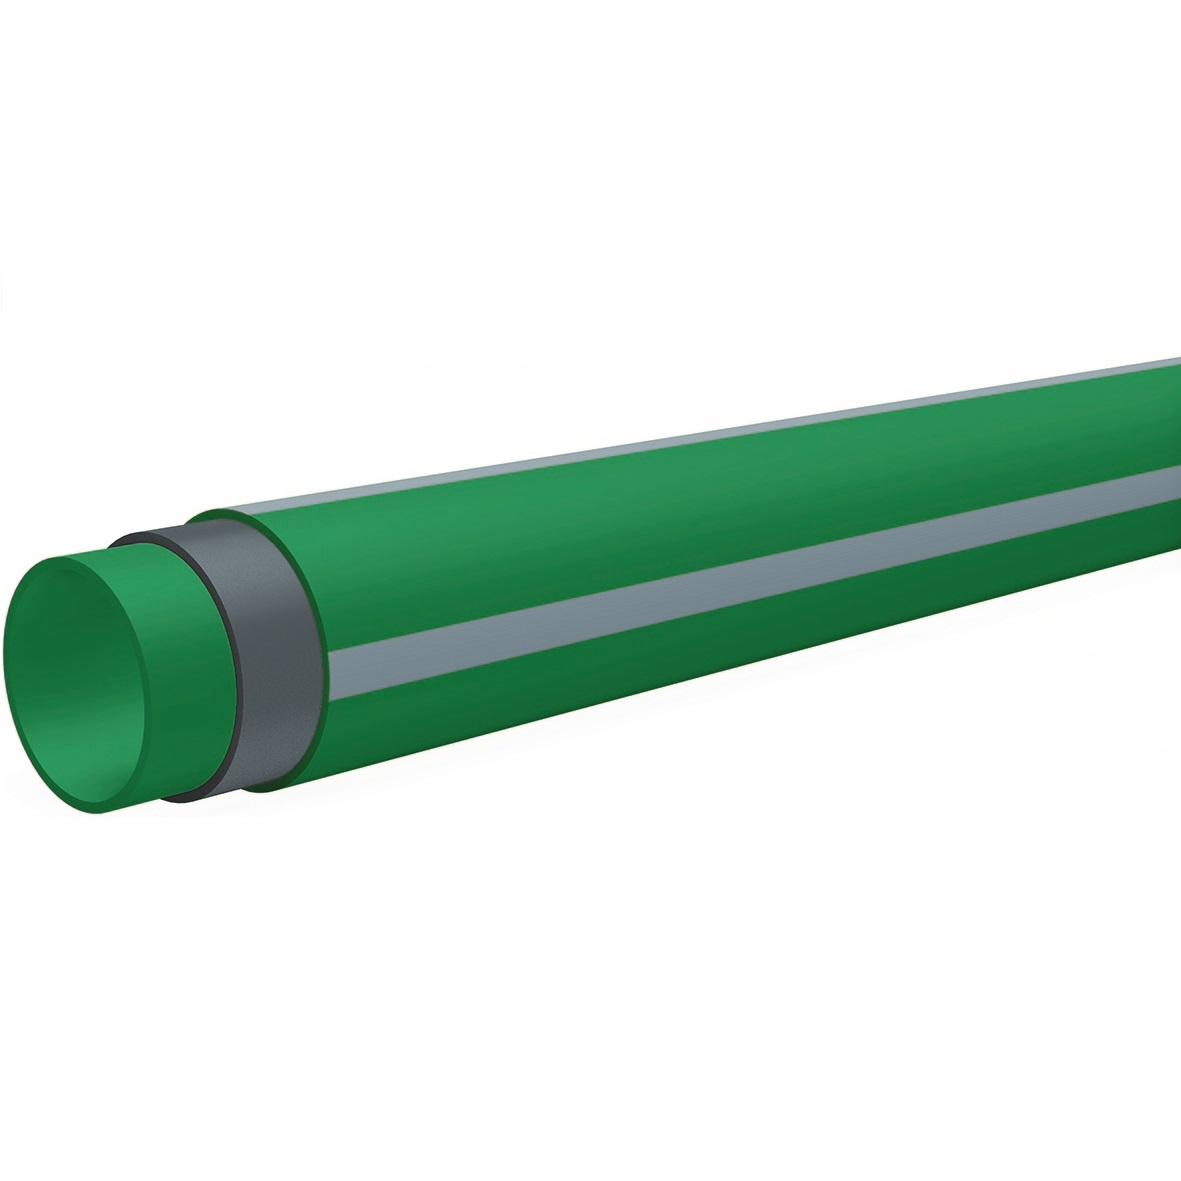 B'R Watertec PP-RCT /GLASVEZEL Buis Groen + grijze streep d110x12,3mmx4m PN20/SDR9 7FW3144011